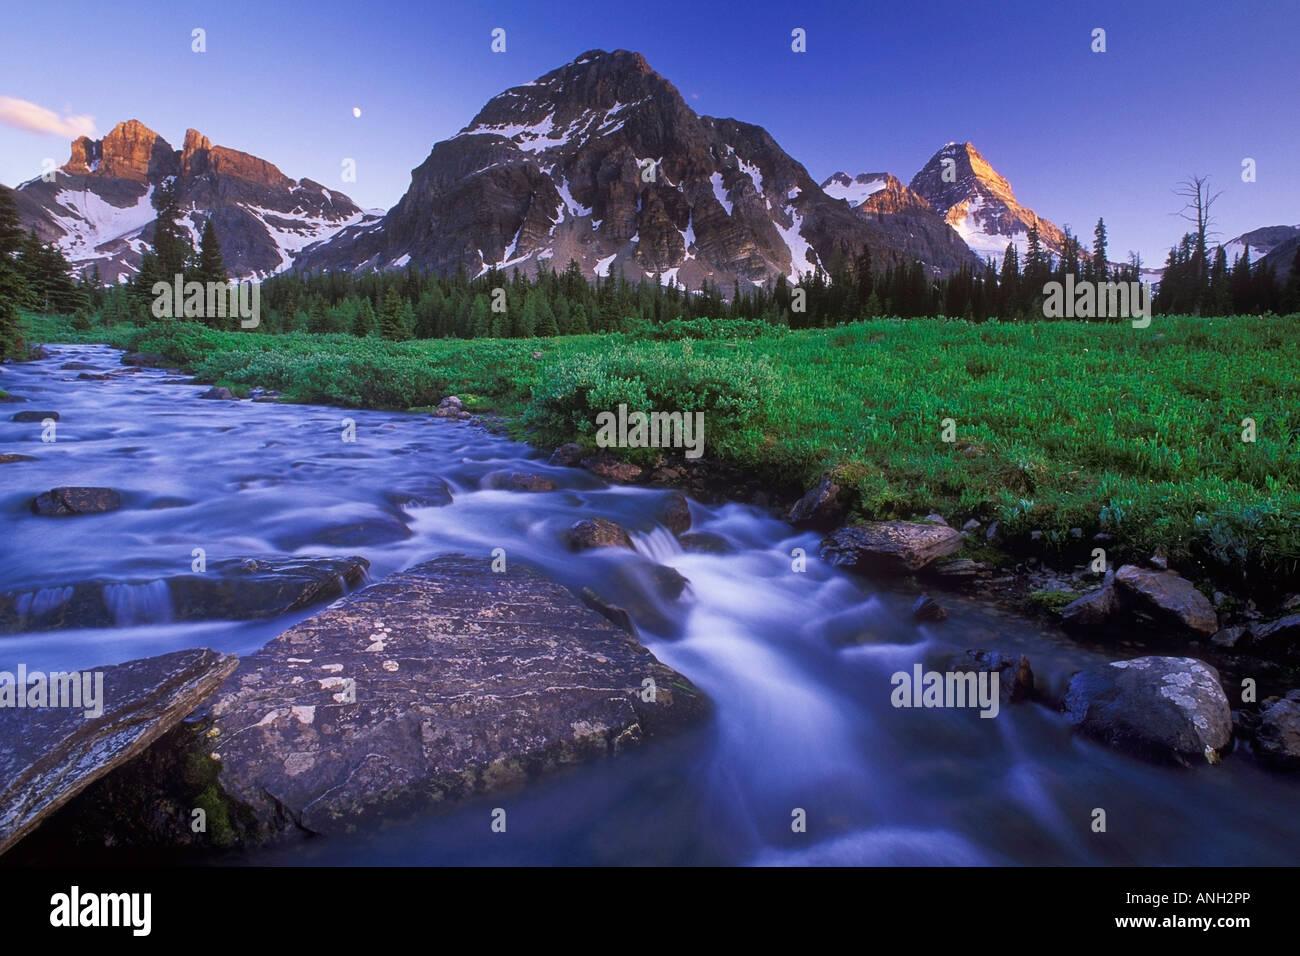 Magog Creek and Naiset Point, Mount Assiniboine Provincial Park, British Columbia, Canada. Stock Photo